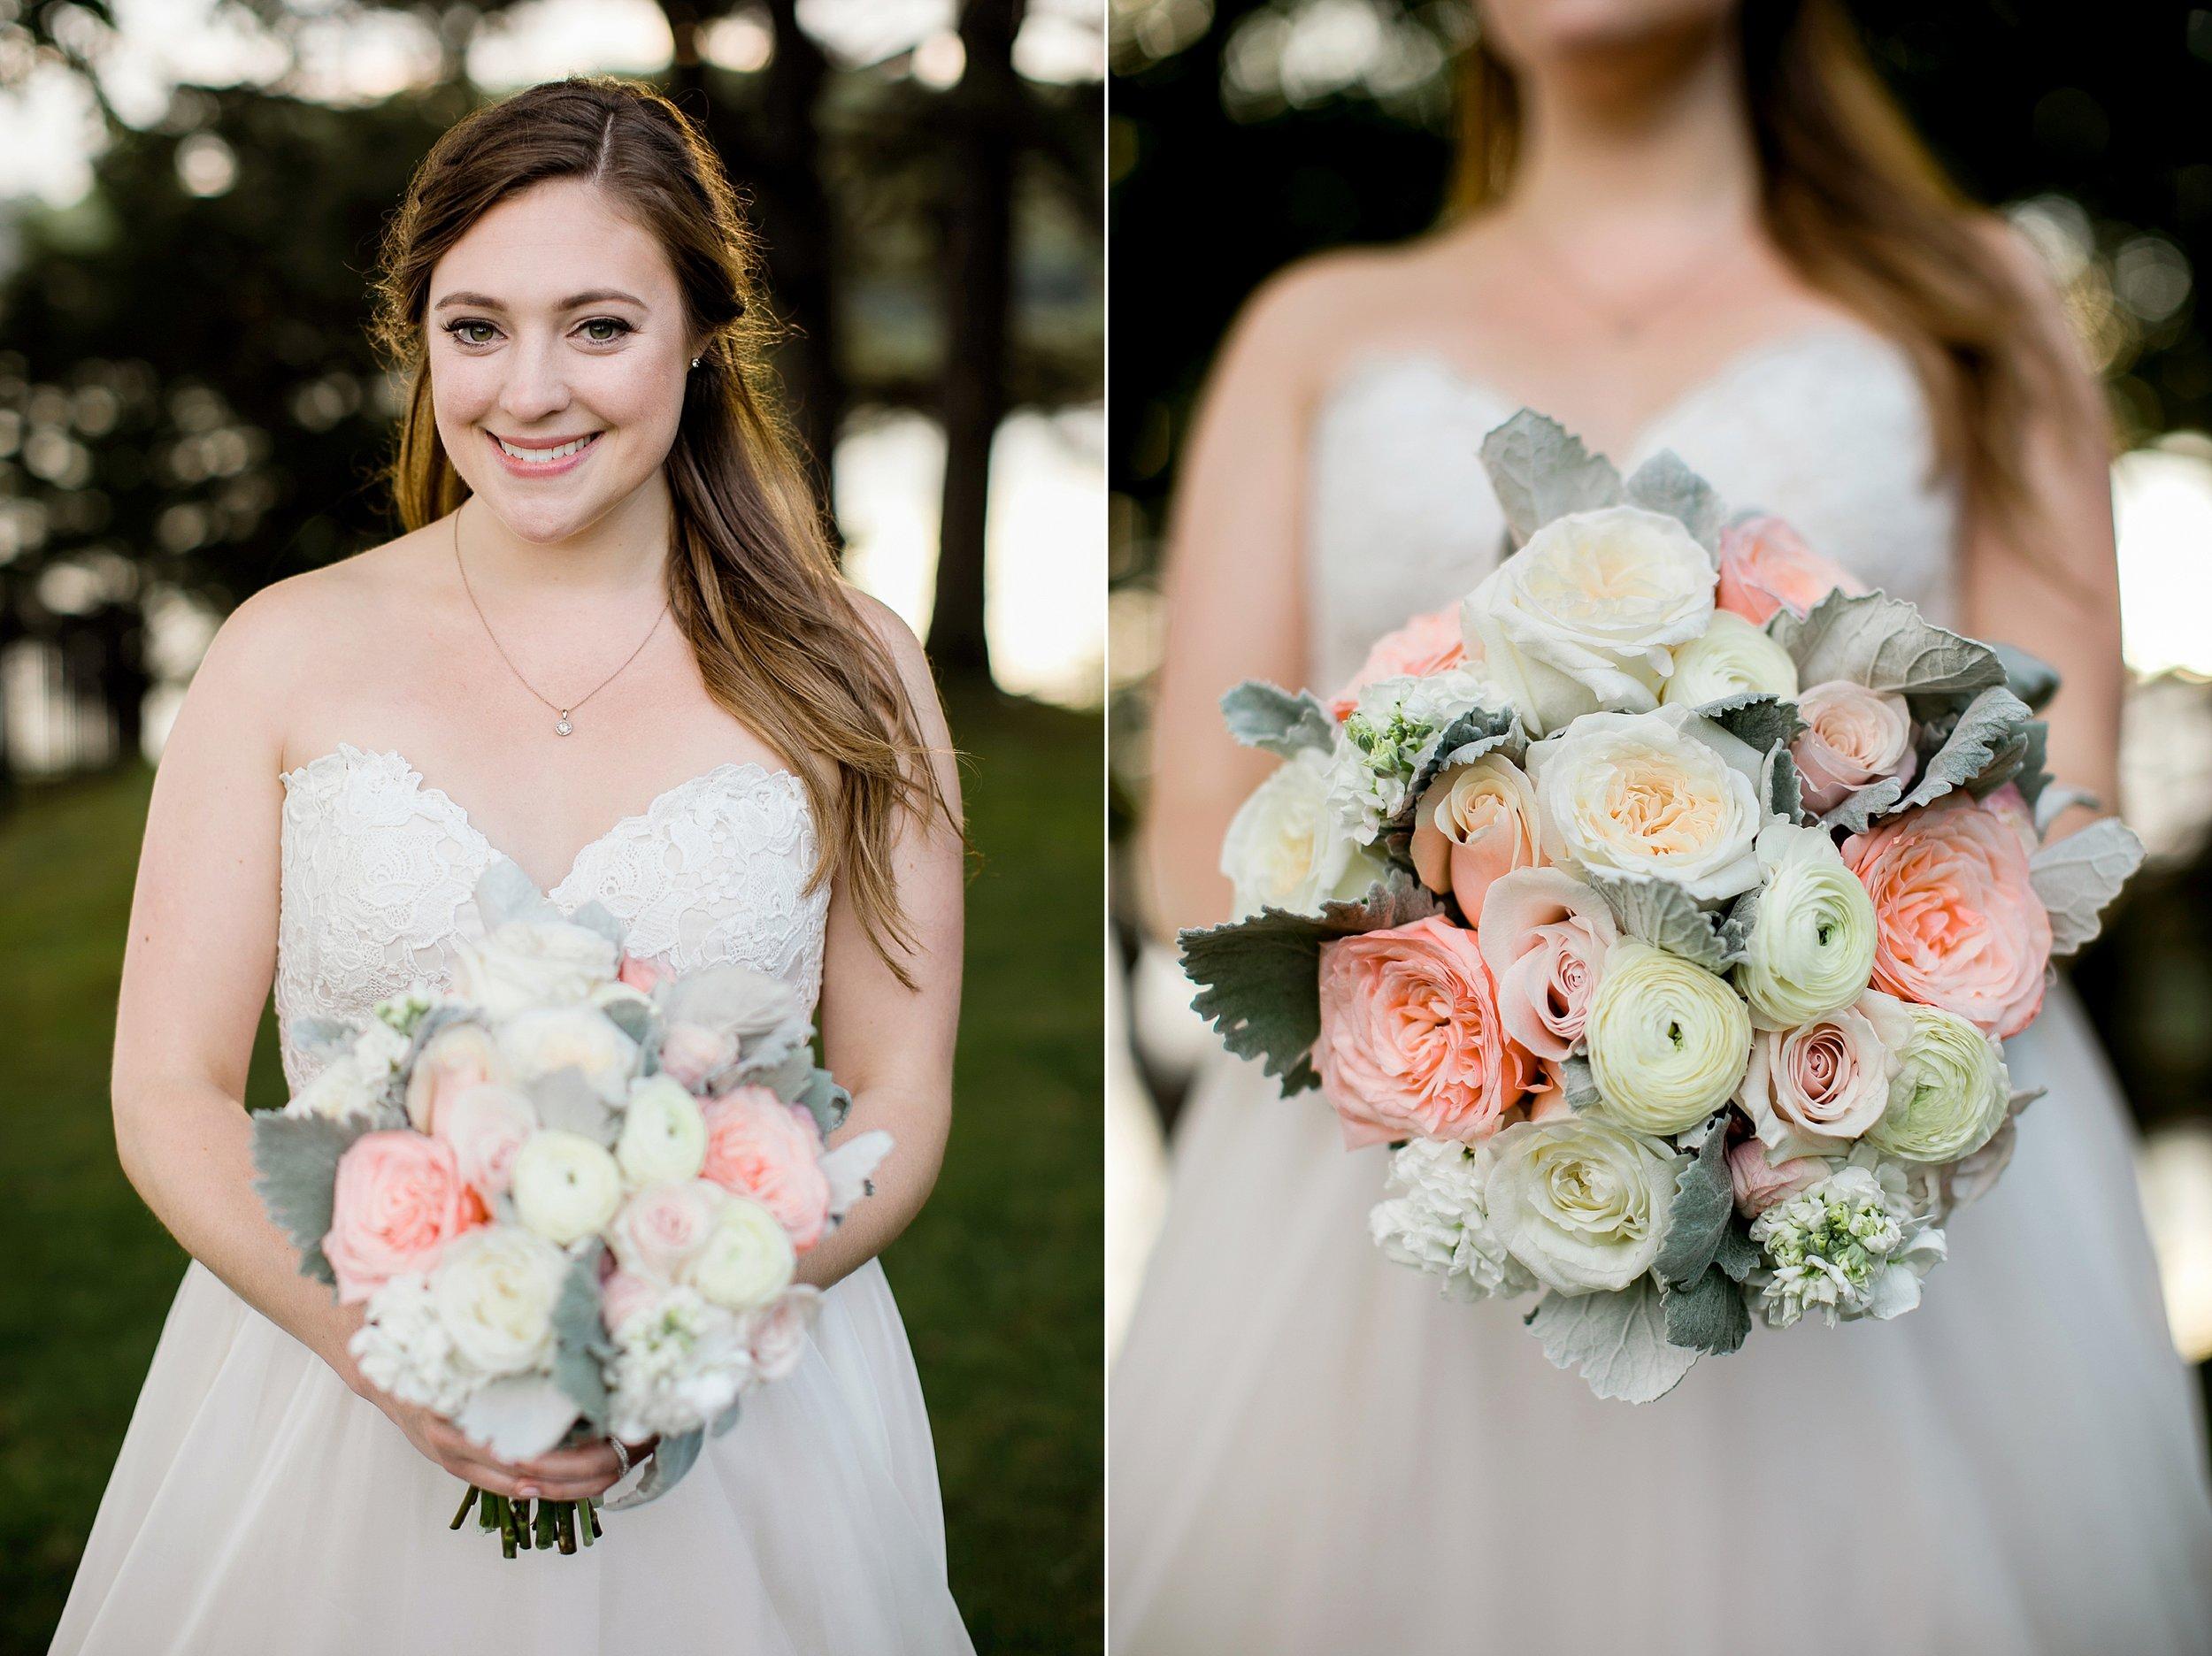 020 los angeles wedding photographer todd danforth photography boston.jpg